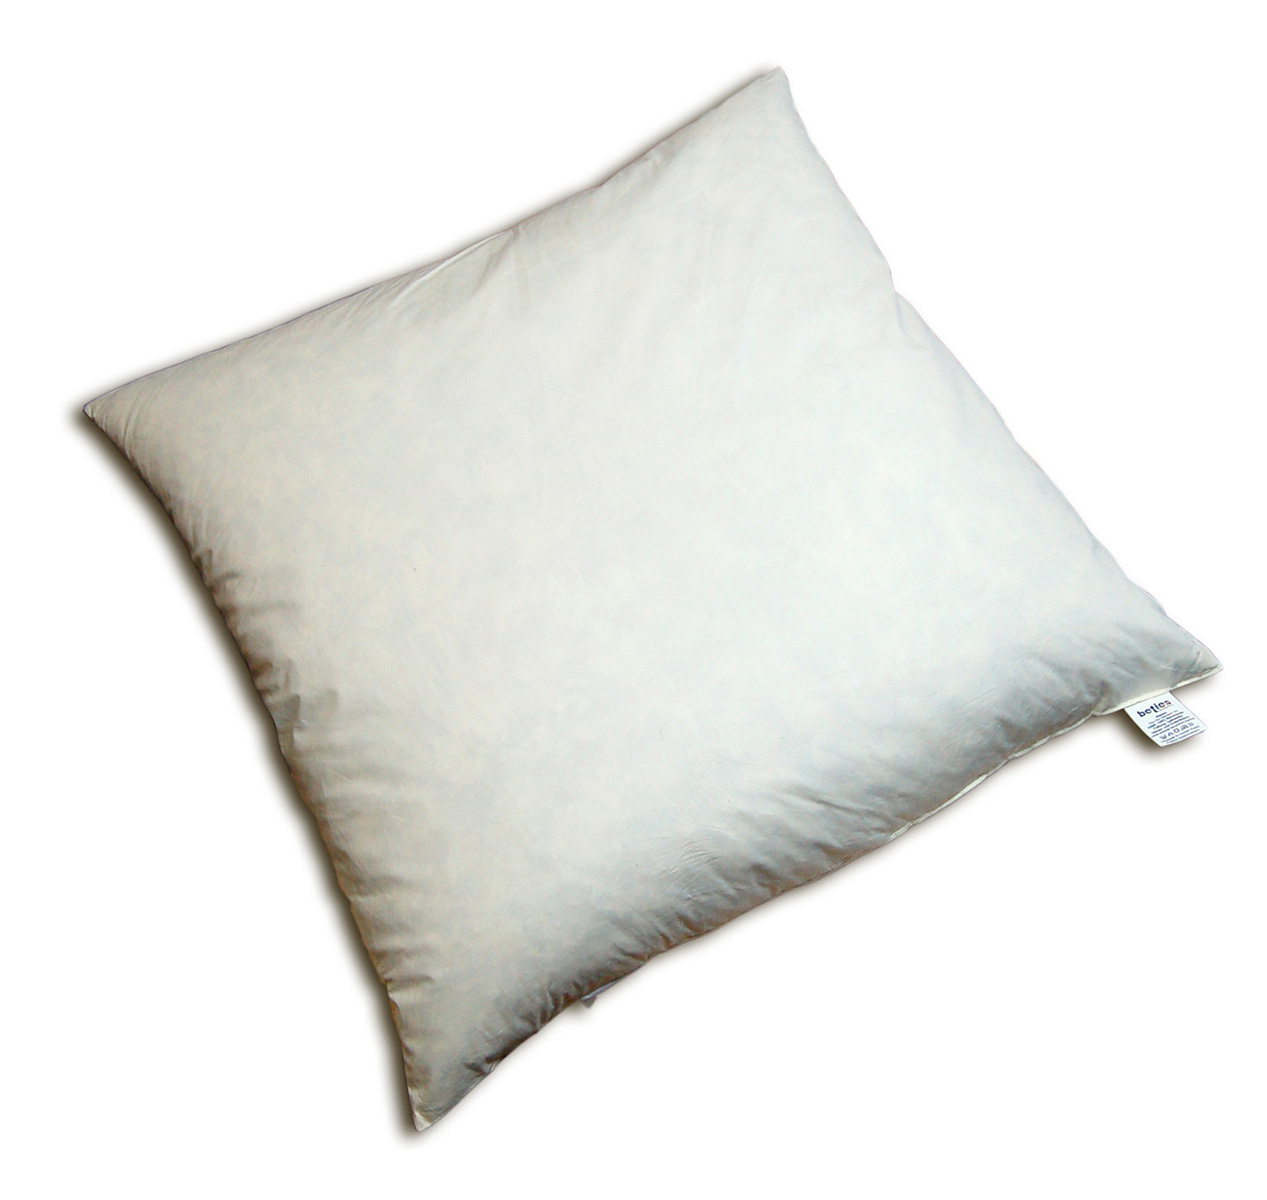 Federkissen Ca 70x70 Cm Waschbar Bezug Baumwolle Beties